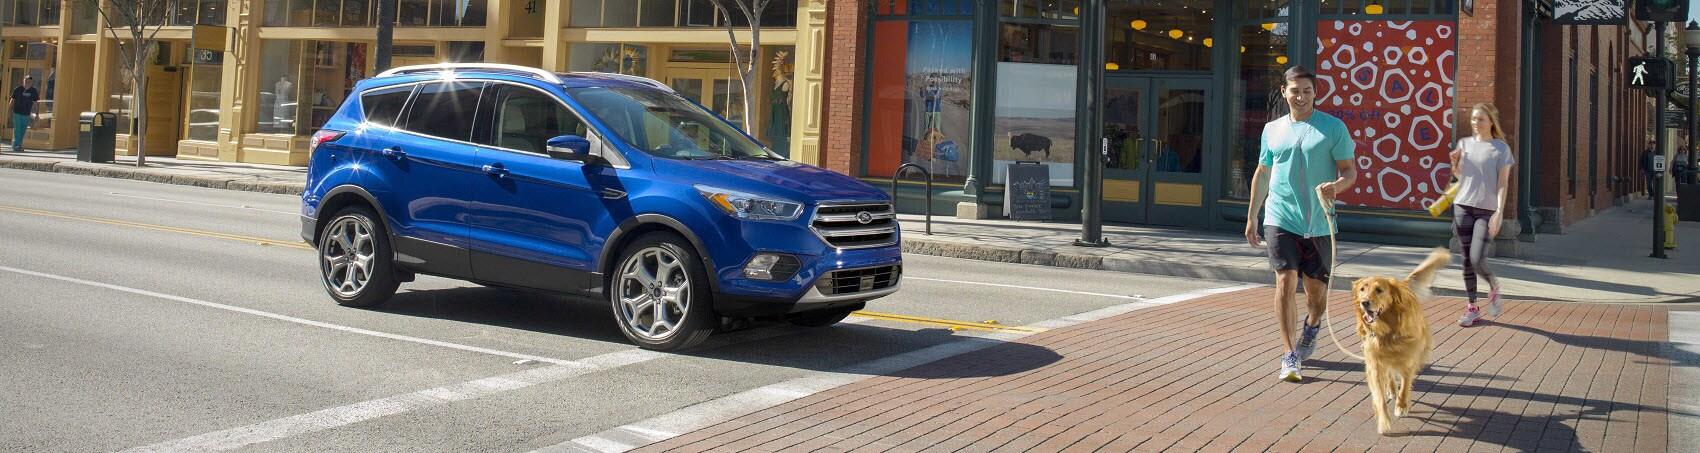 Ford Edge Gas Mileage >> Ford Escape Gas Mileage Cincinnati Oh Fuller Ford